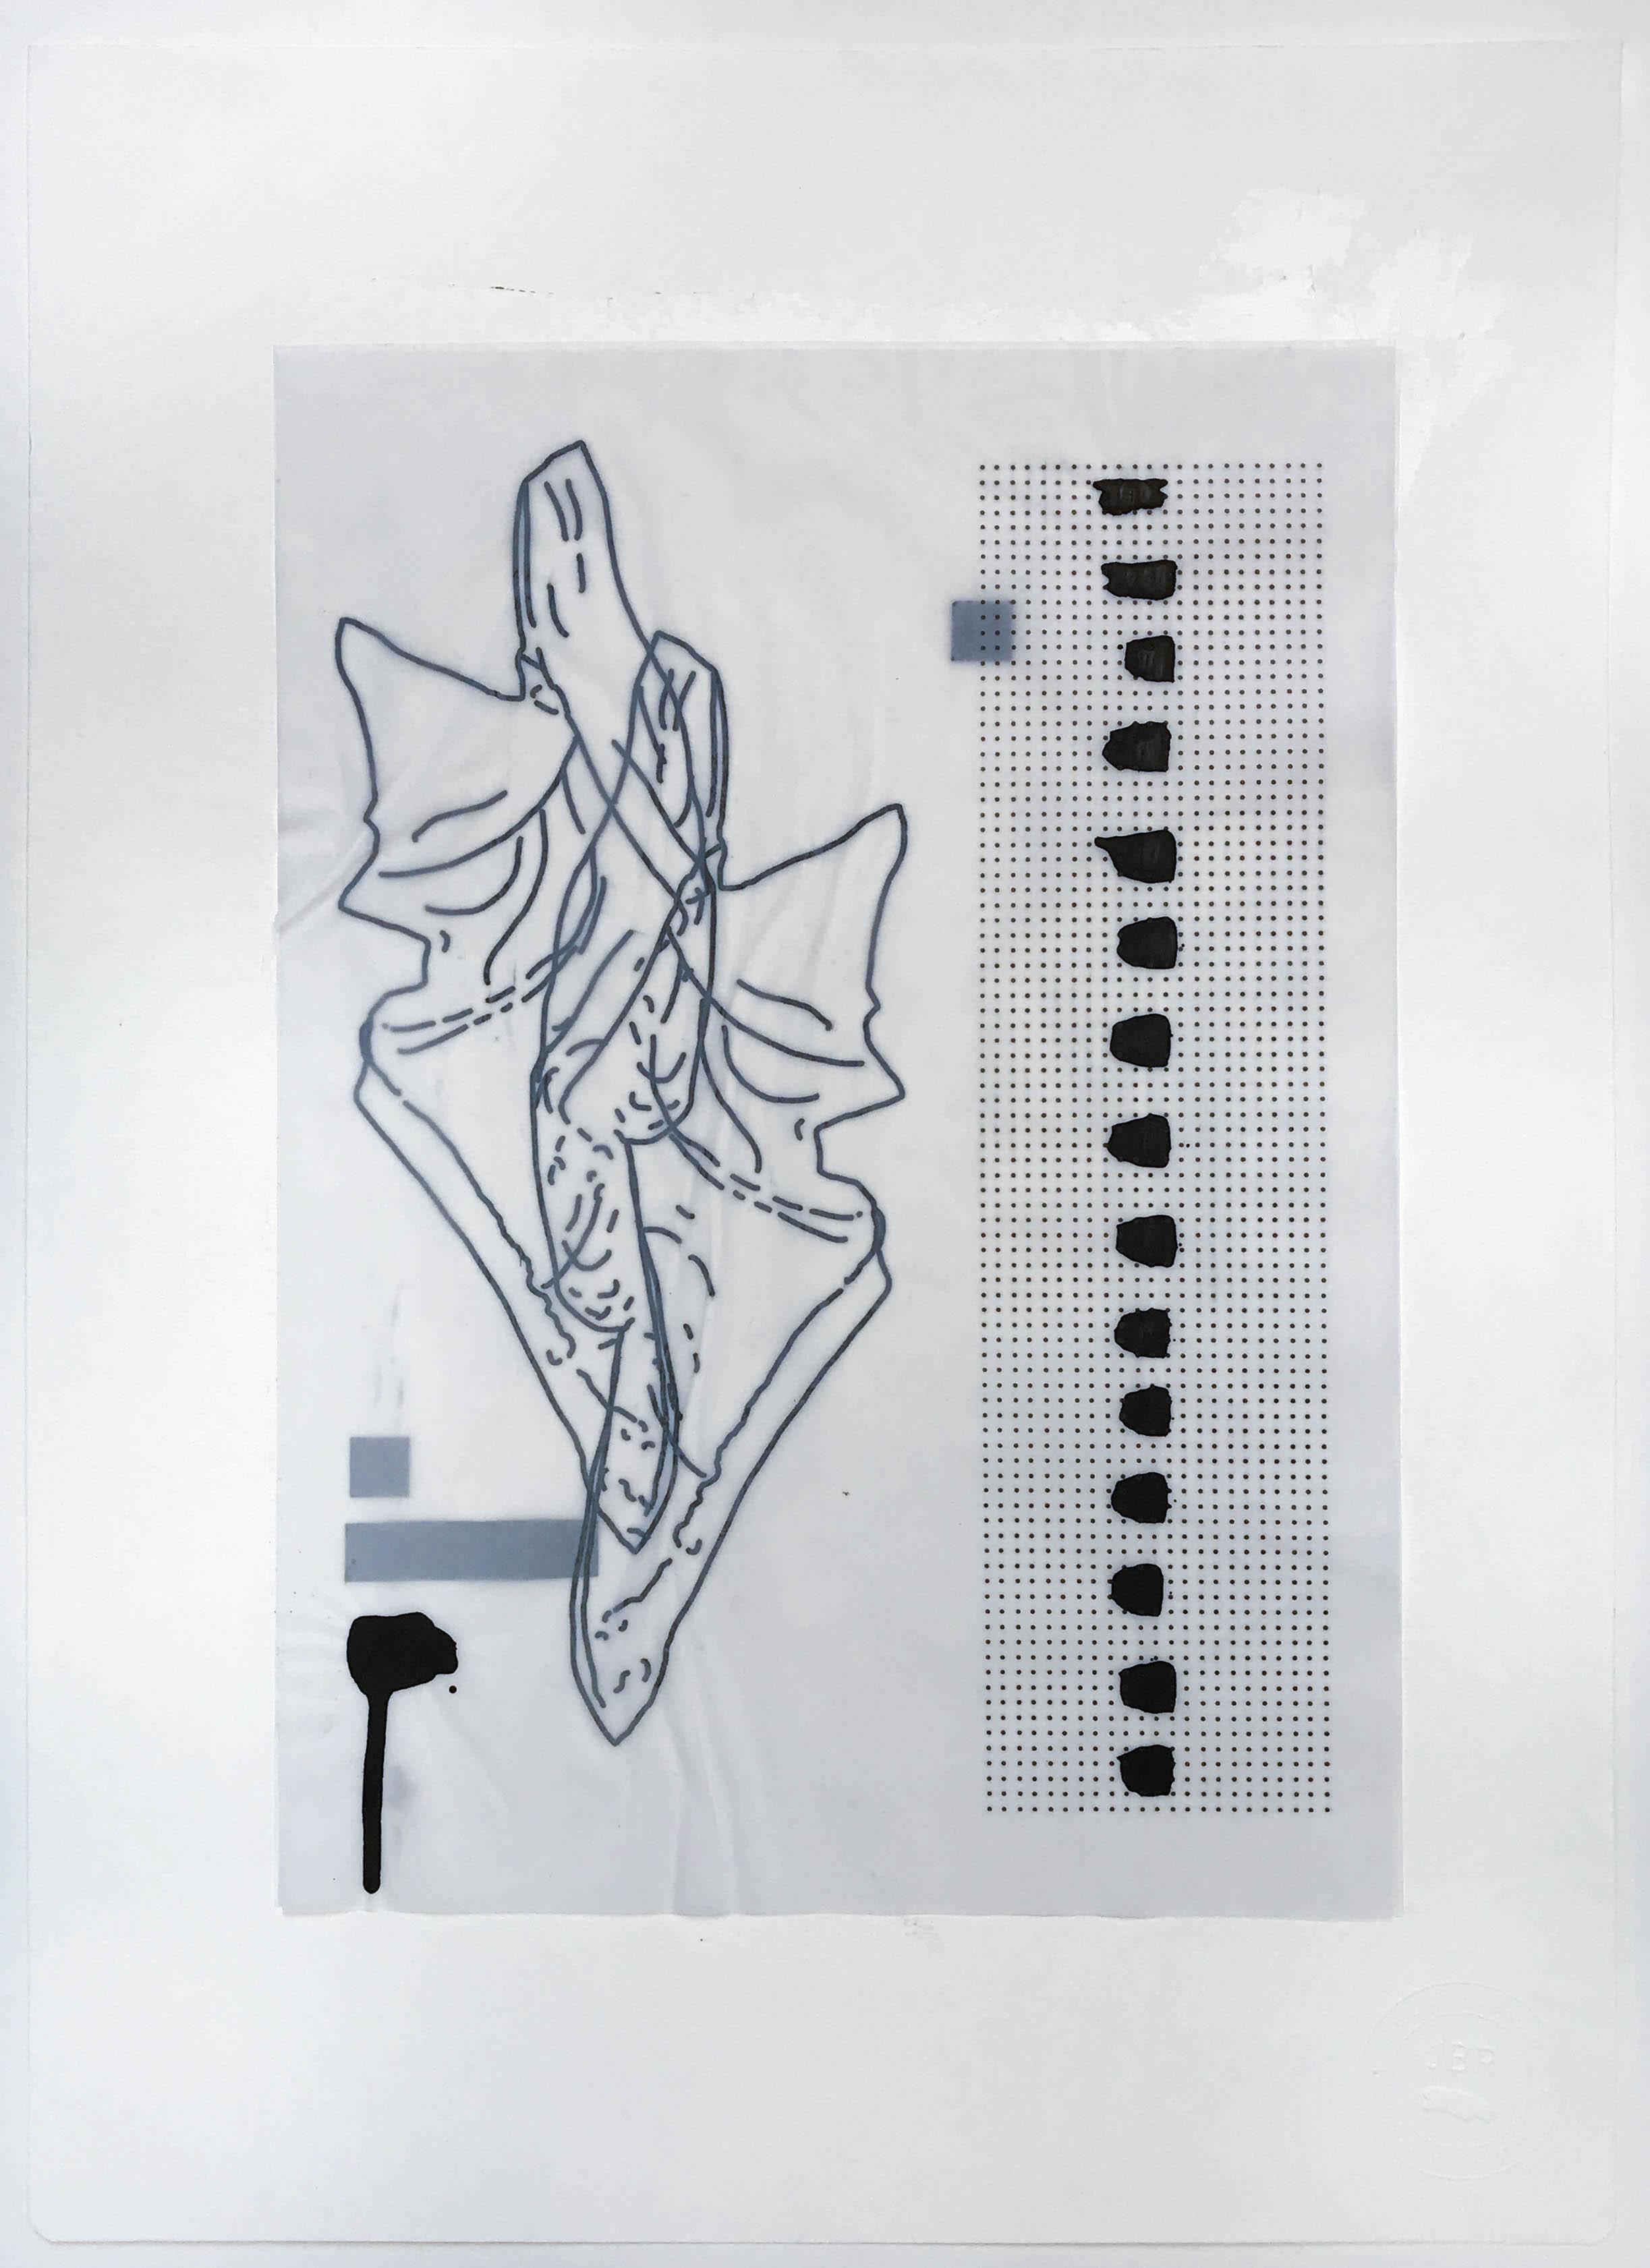 %22Closeminded%22- Técnica mixta  - 42 x 30 cm - Julián Brangold - 2018.jpg